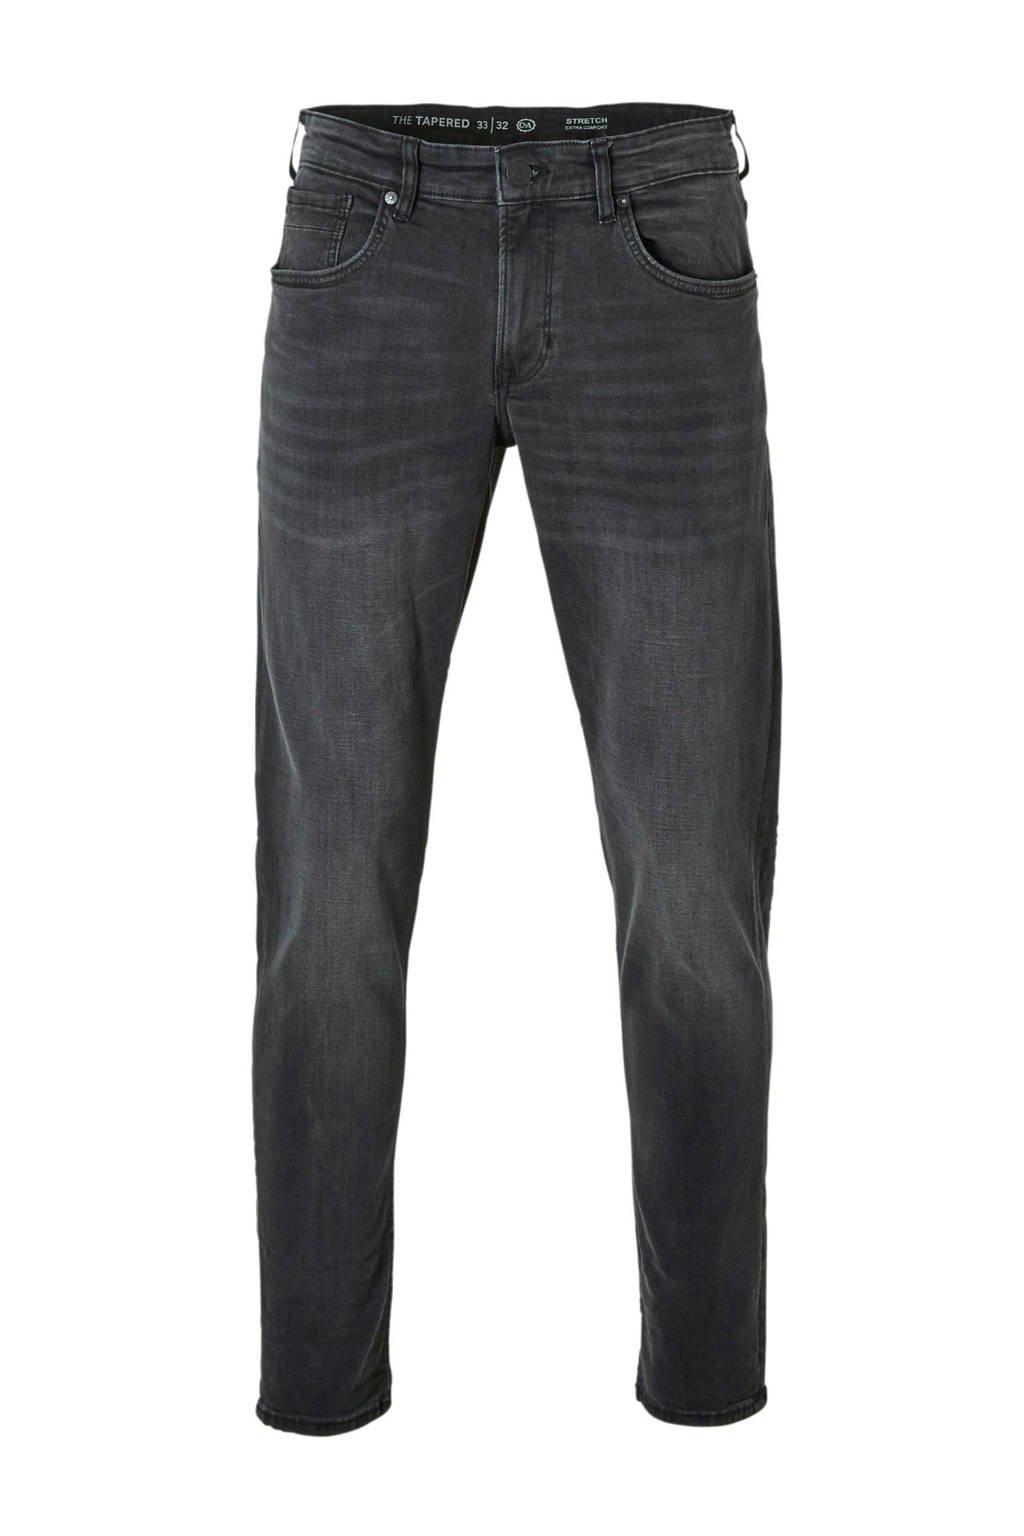 C&A The Denim tapered fit jeans grijs, Grijs